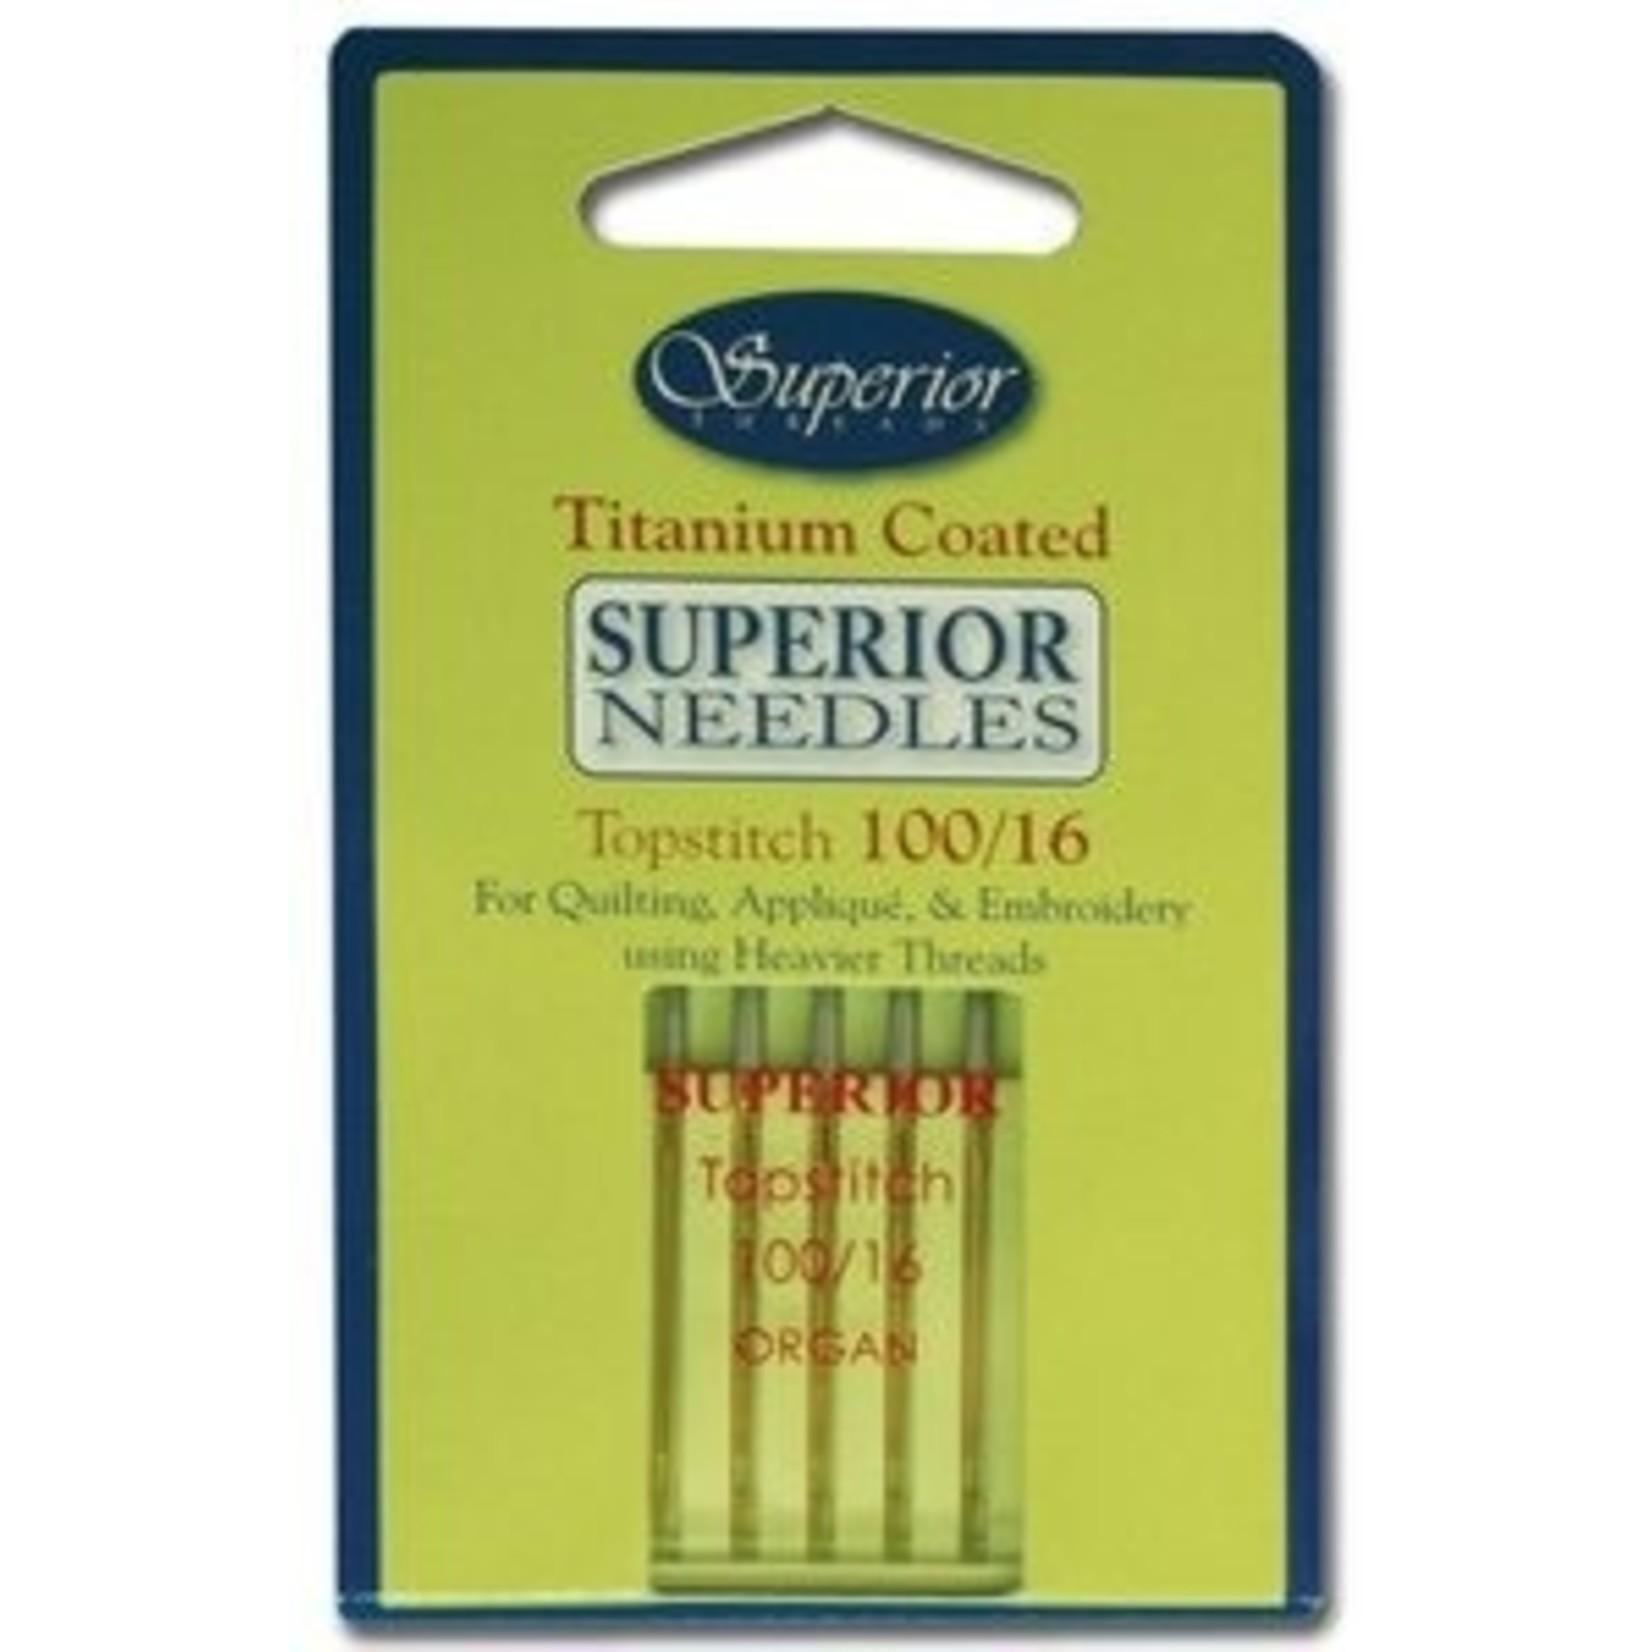 Superior Threads Naaimachinenaalden - Topstitch - 100/16 - 5 stuks